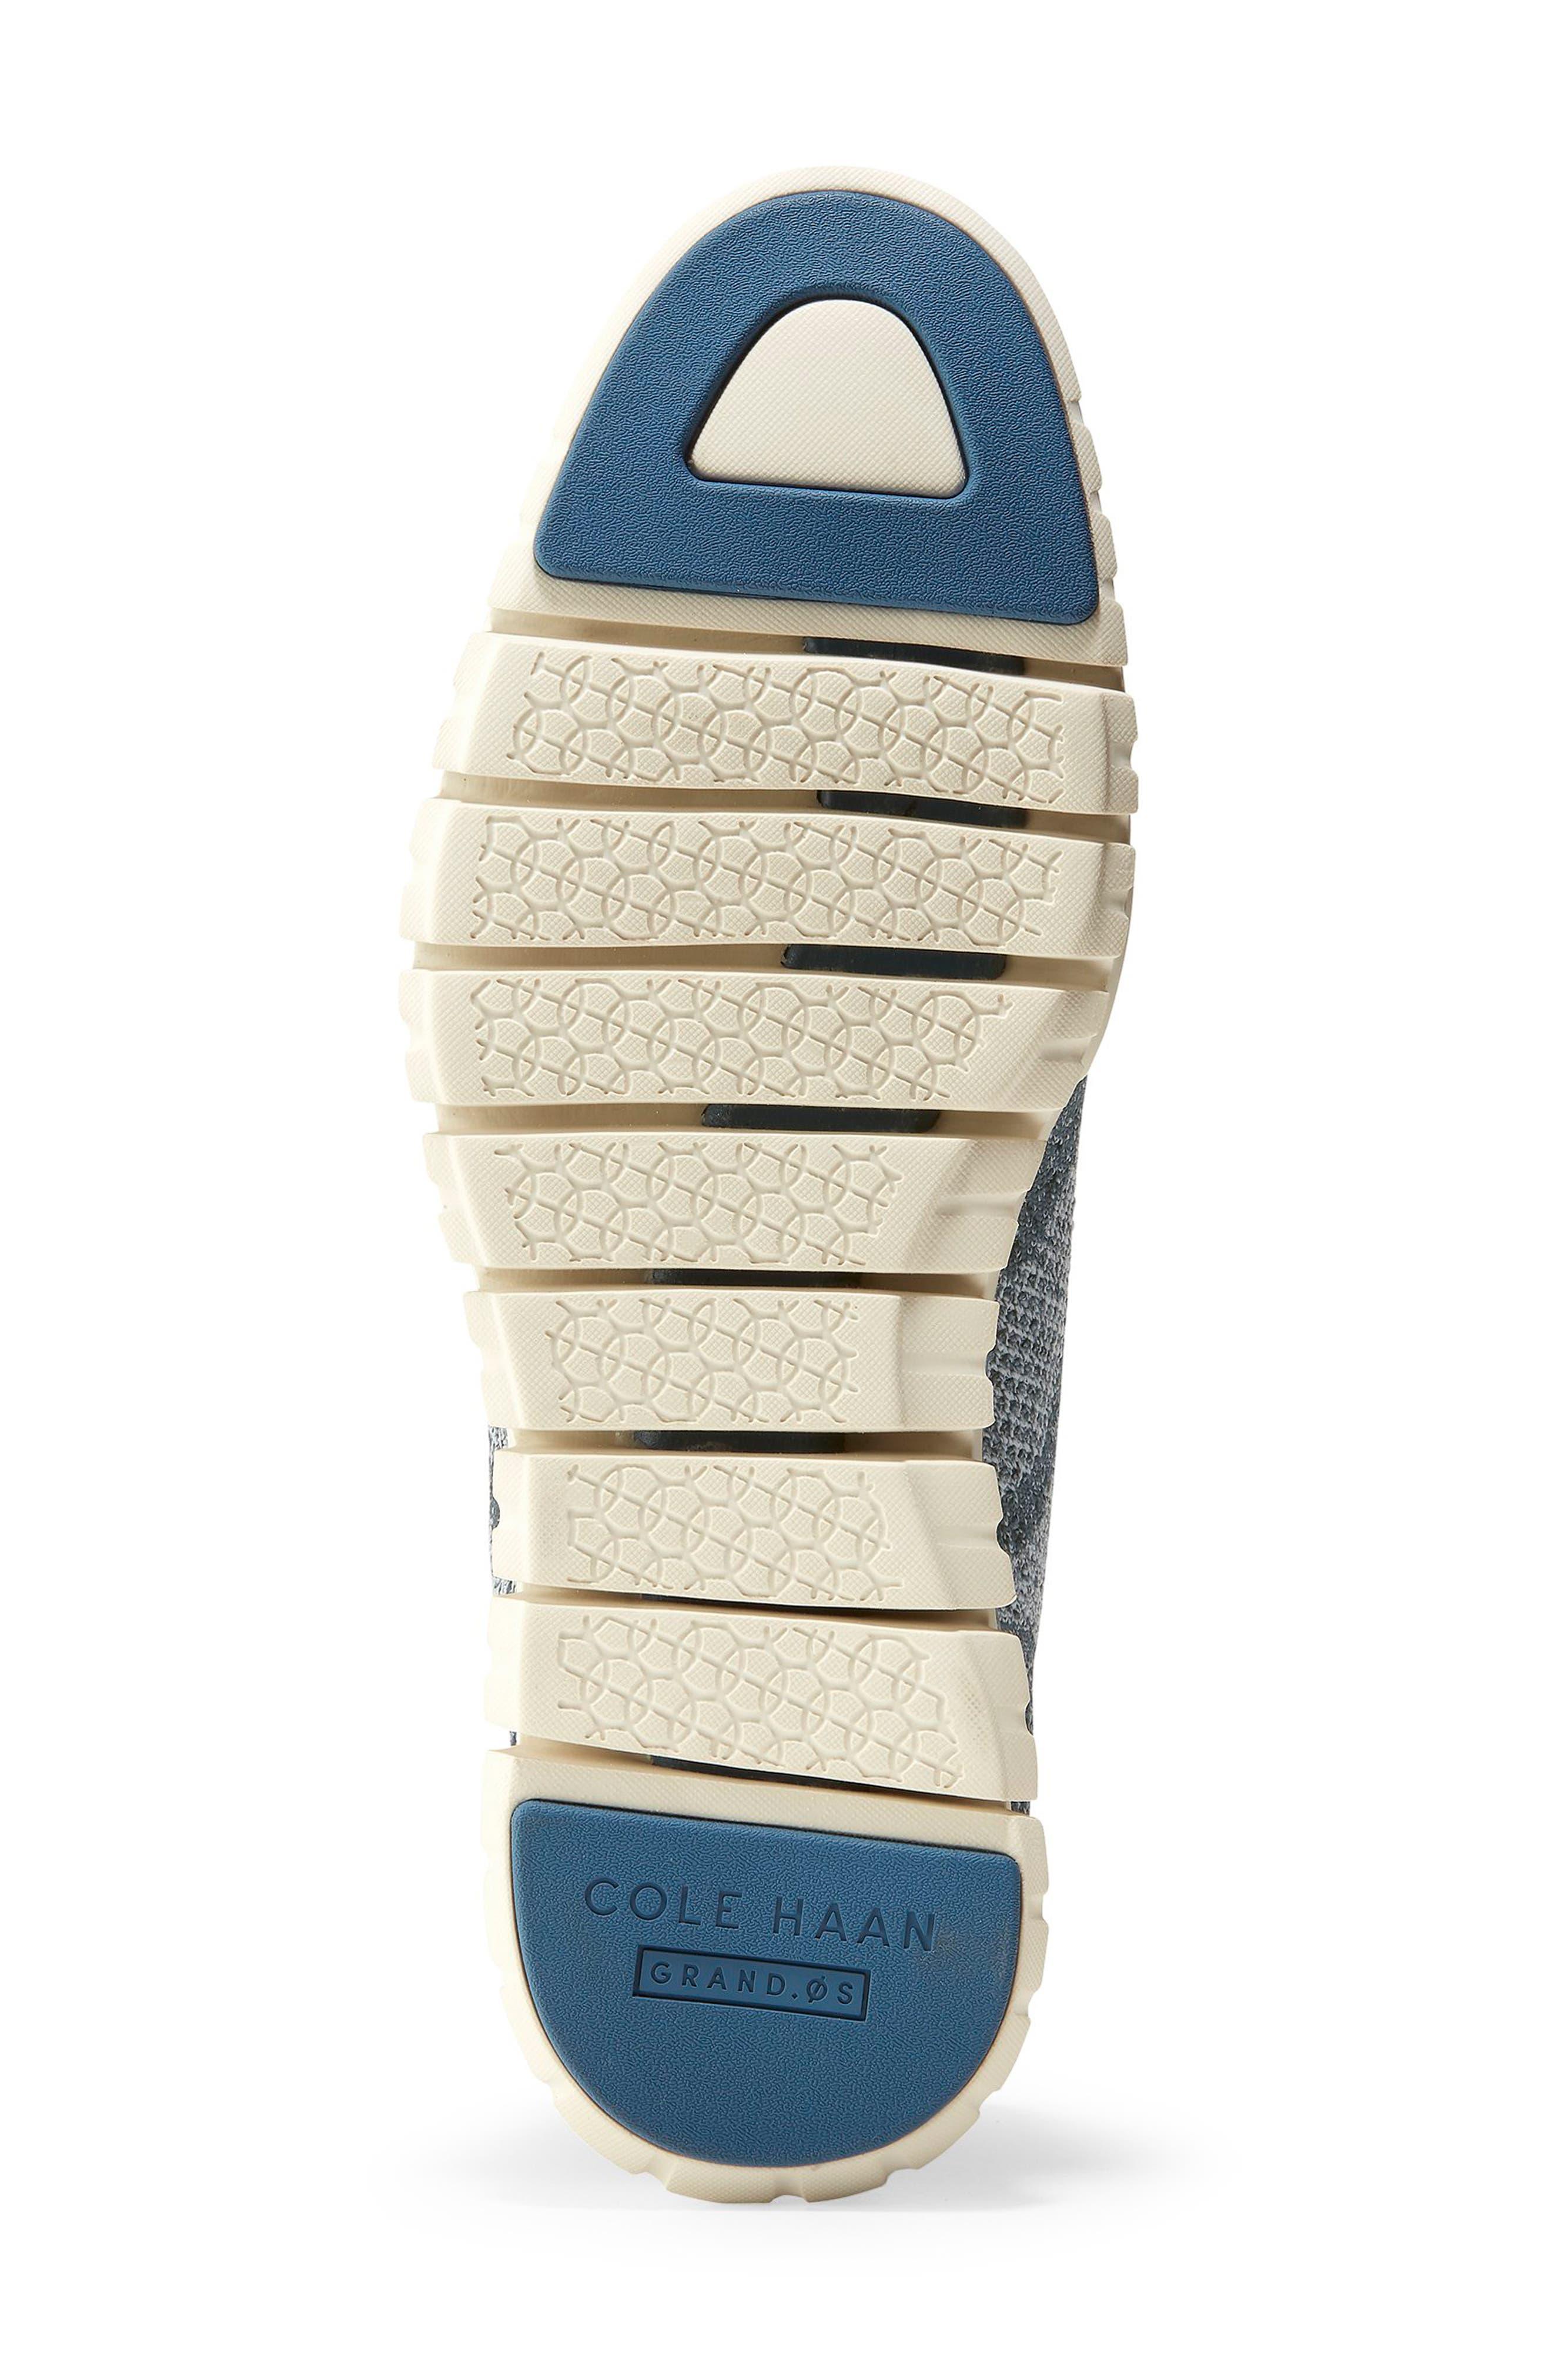 ZeroGrand Stitchlite Woven Wool Wingtip,                             Alternate thumbnail 6, color,                             BLUEBERRY KNIT